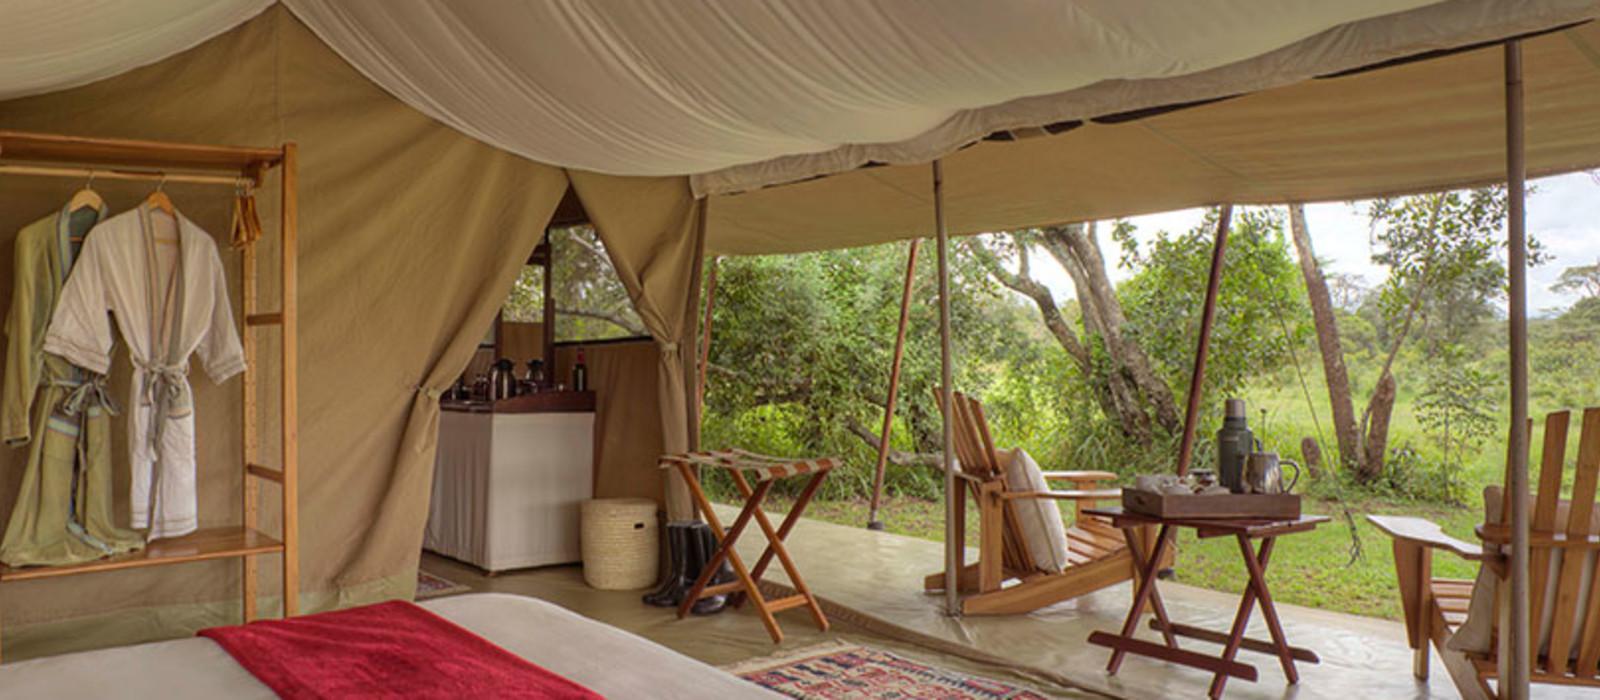 Hotel Ol Pejeta Bush Camp Kenia